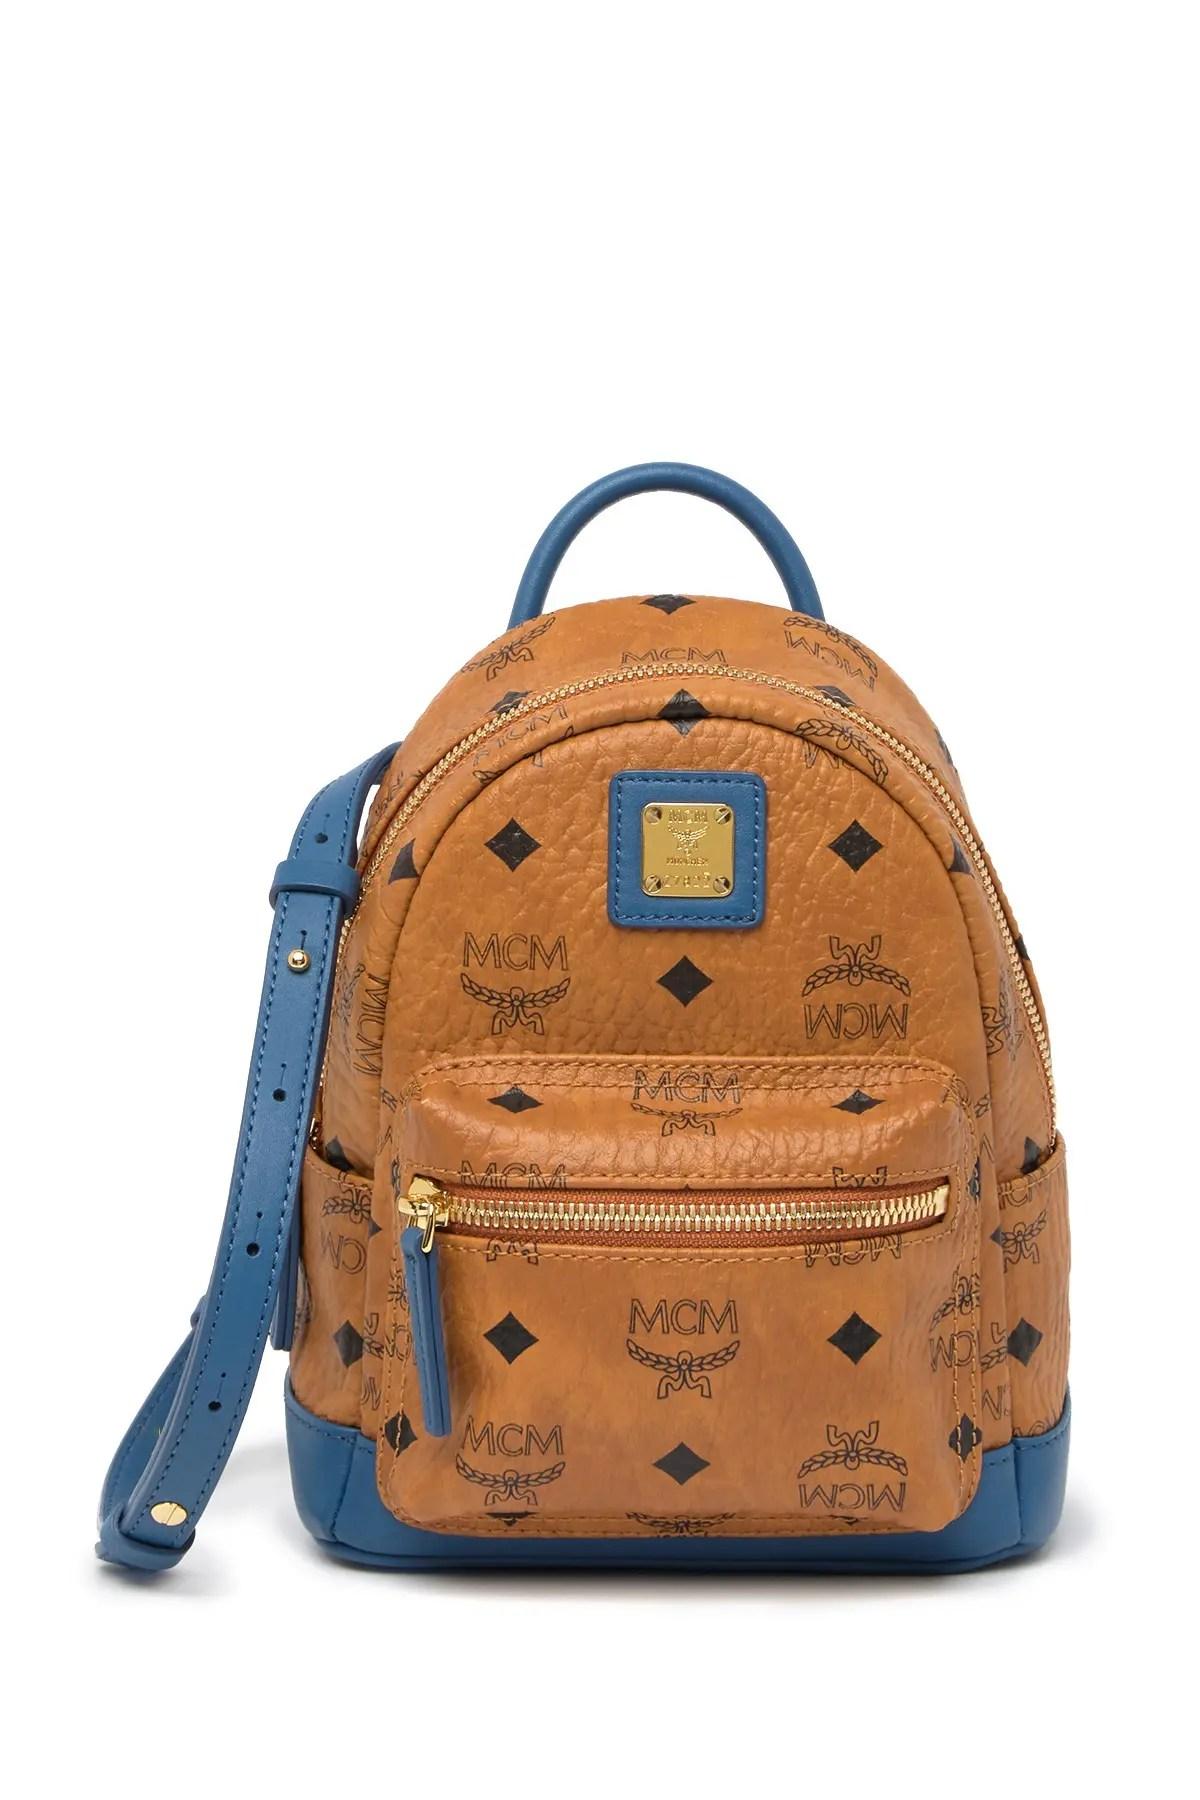 mcm mini visetos backpack nordstrom